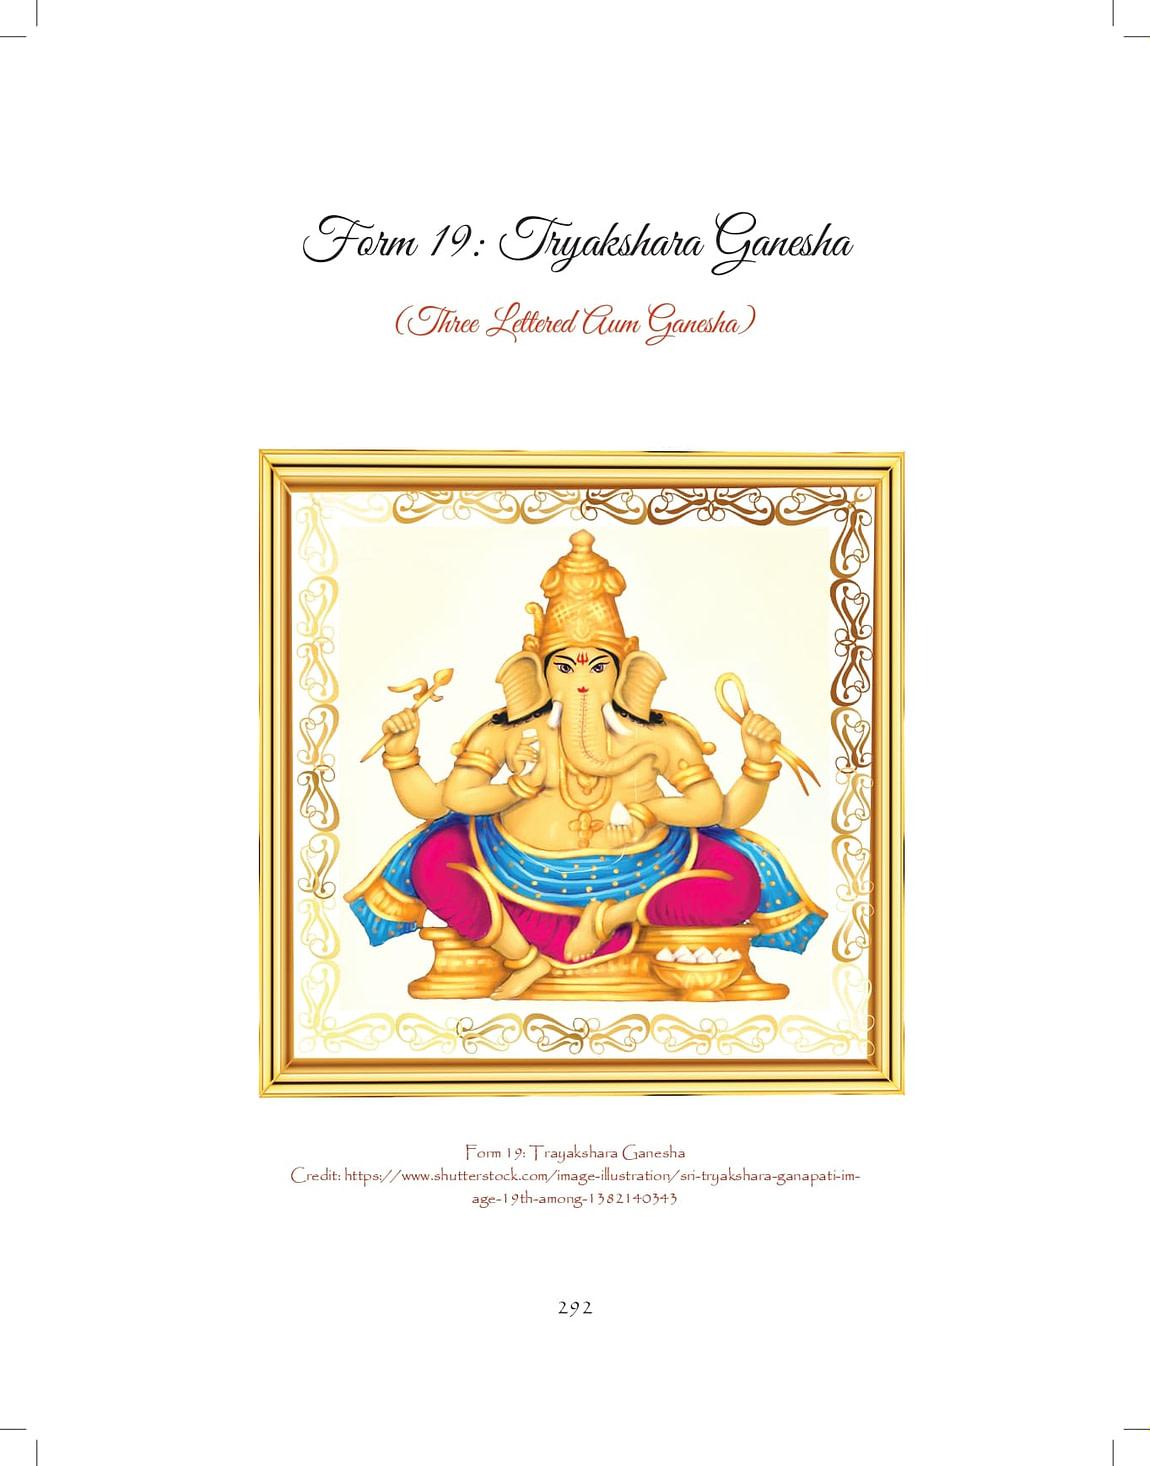 Ganesh-print_pages-to-jpg-0292.jpg